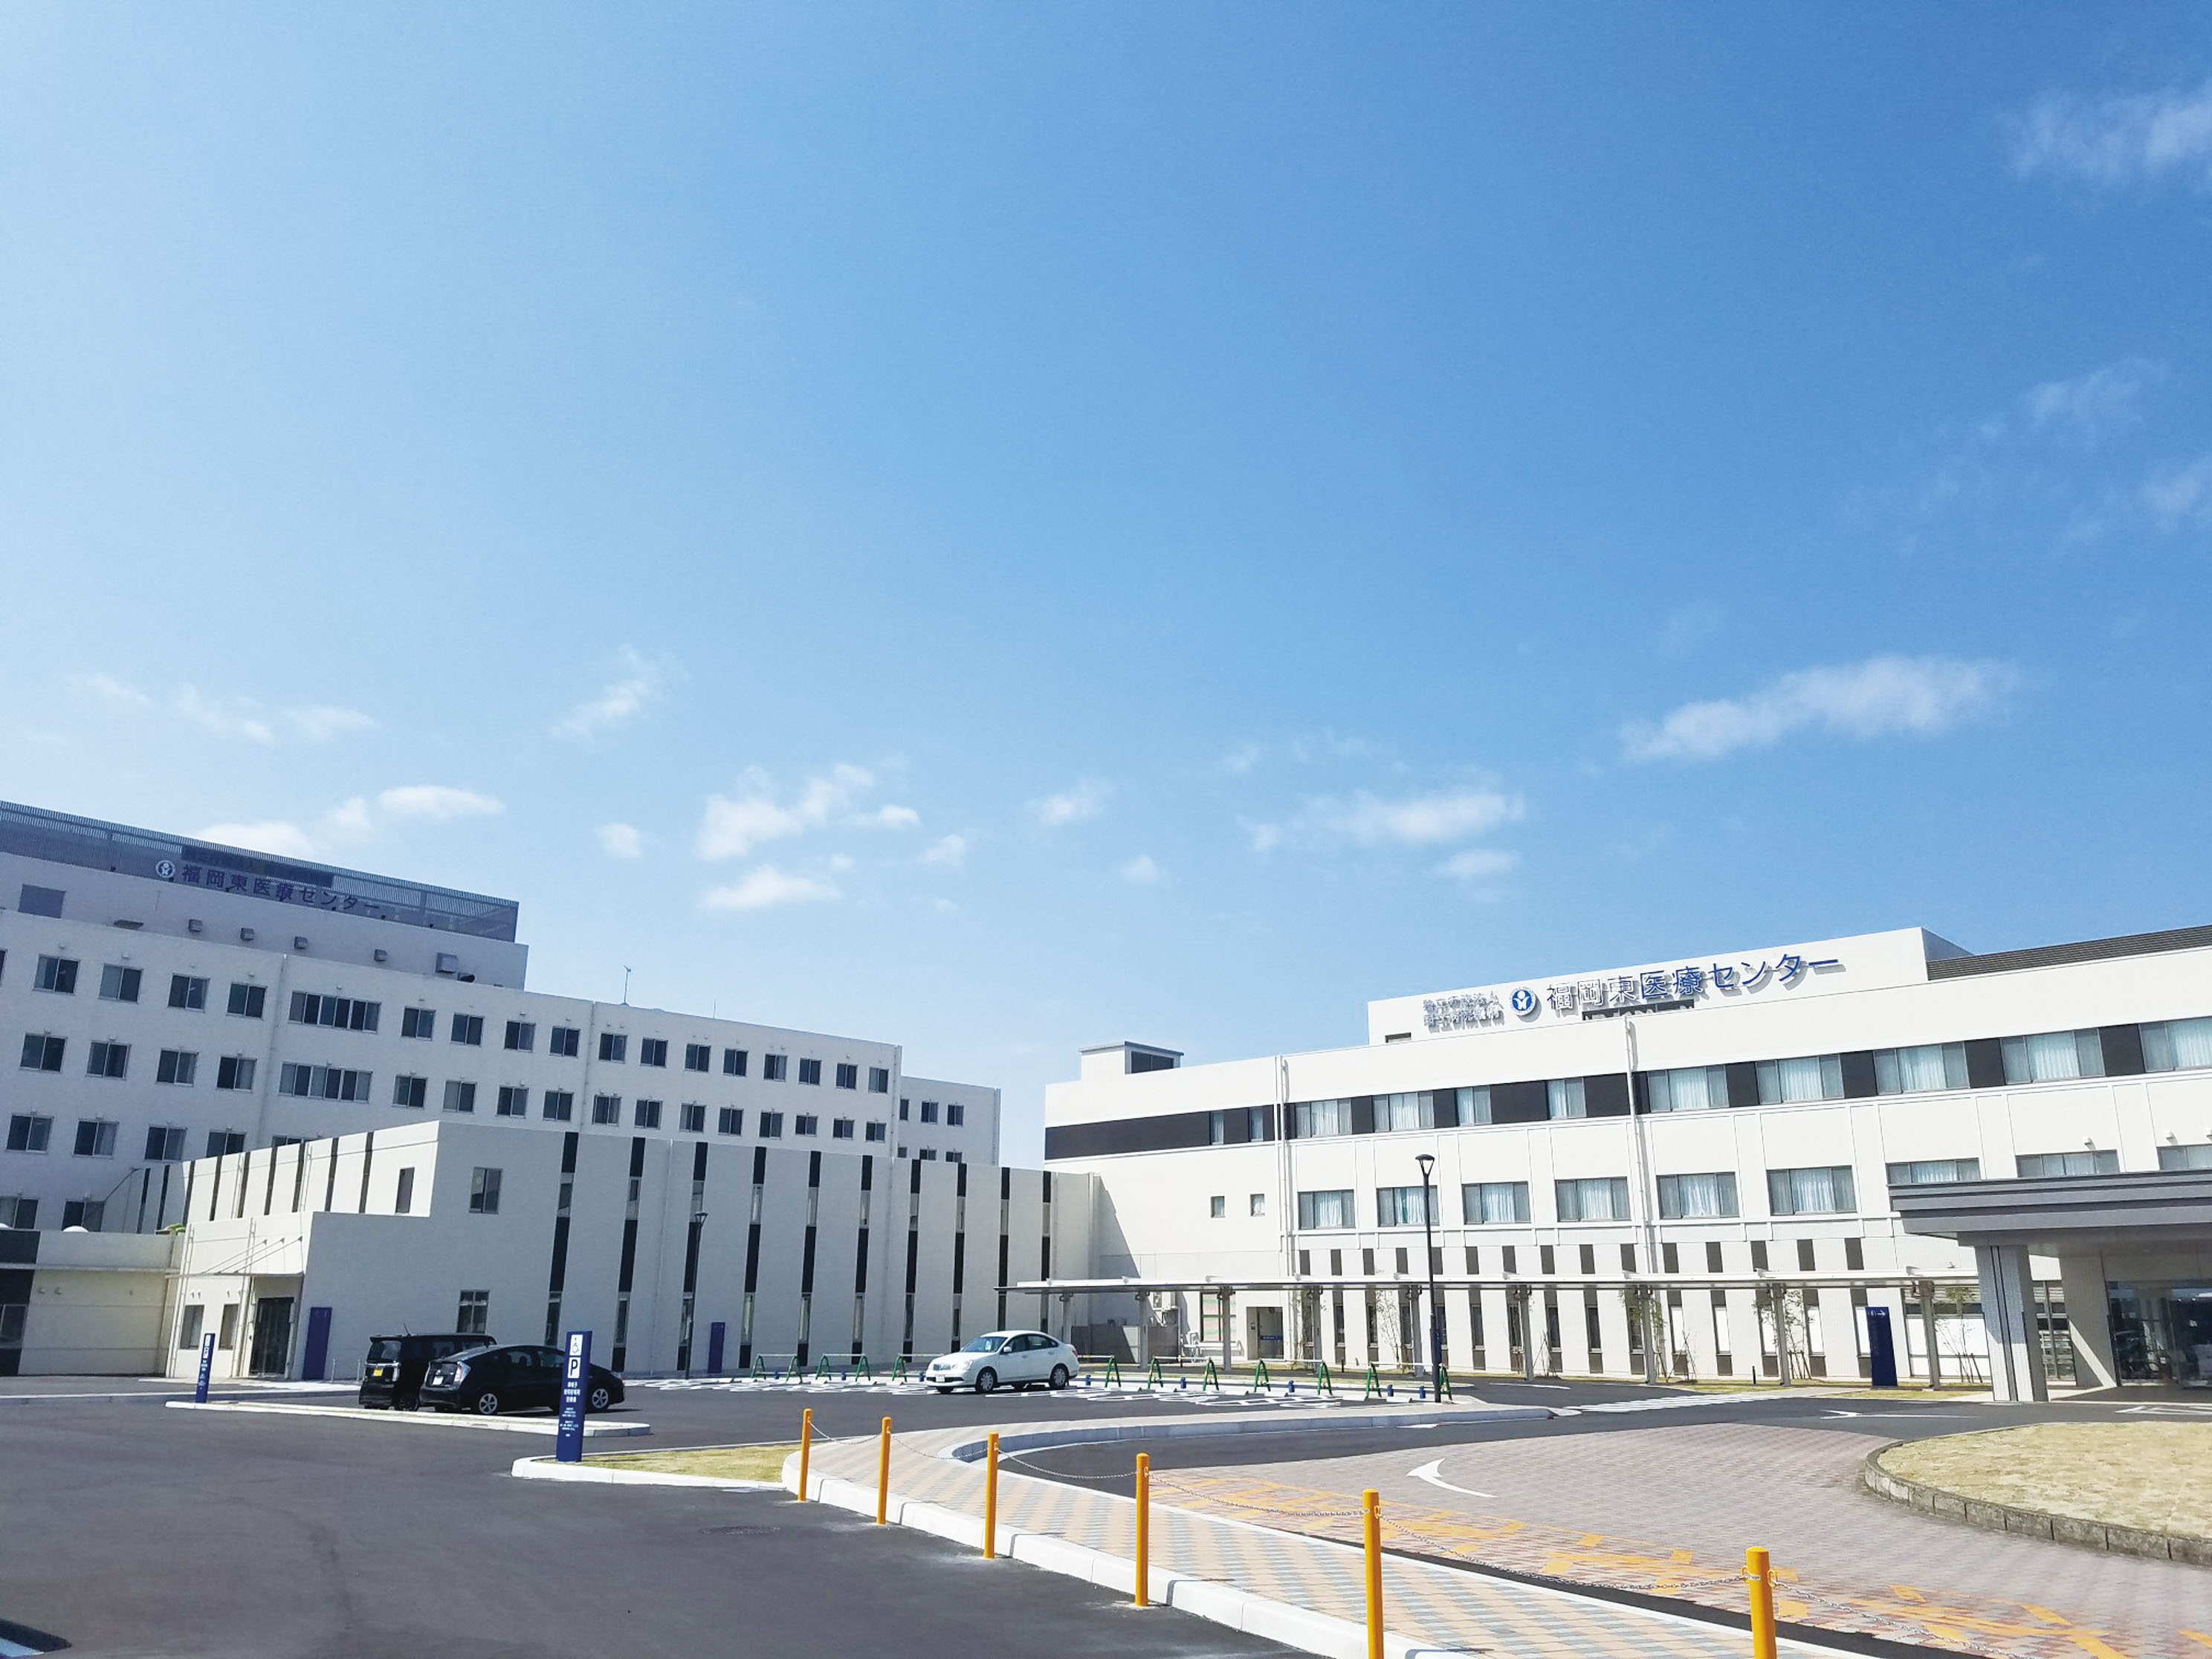 独立行政法人国立病院機構福岡東医療センター